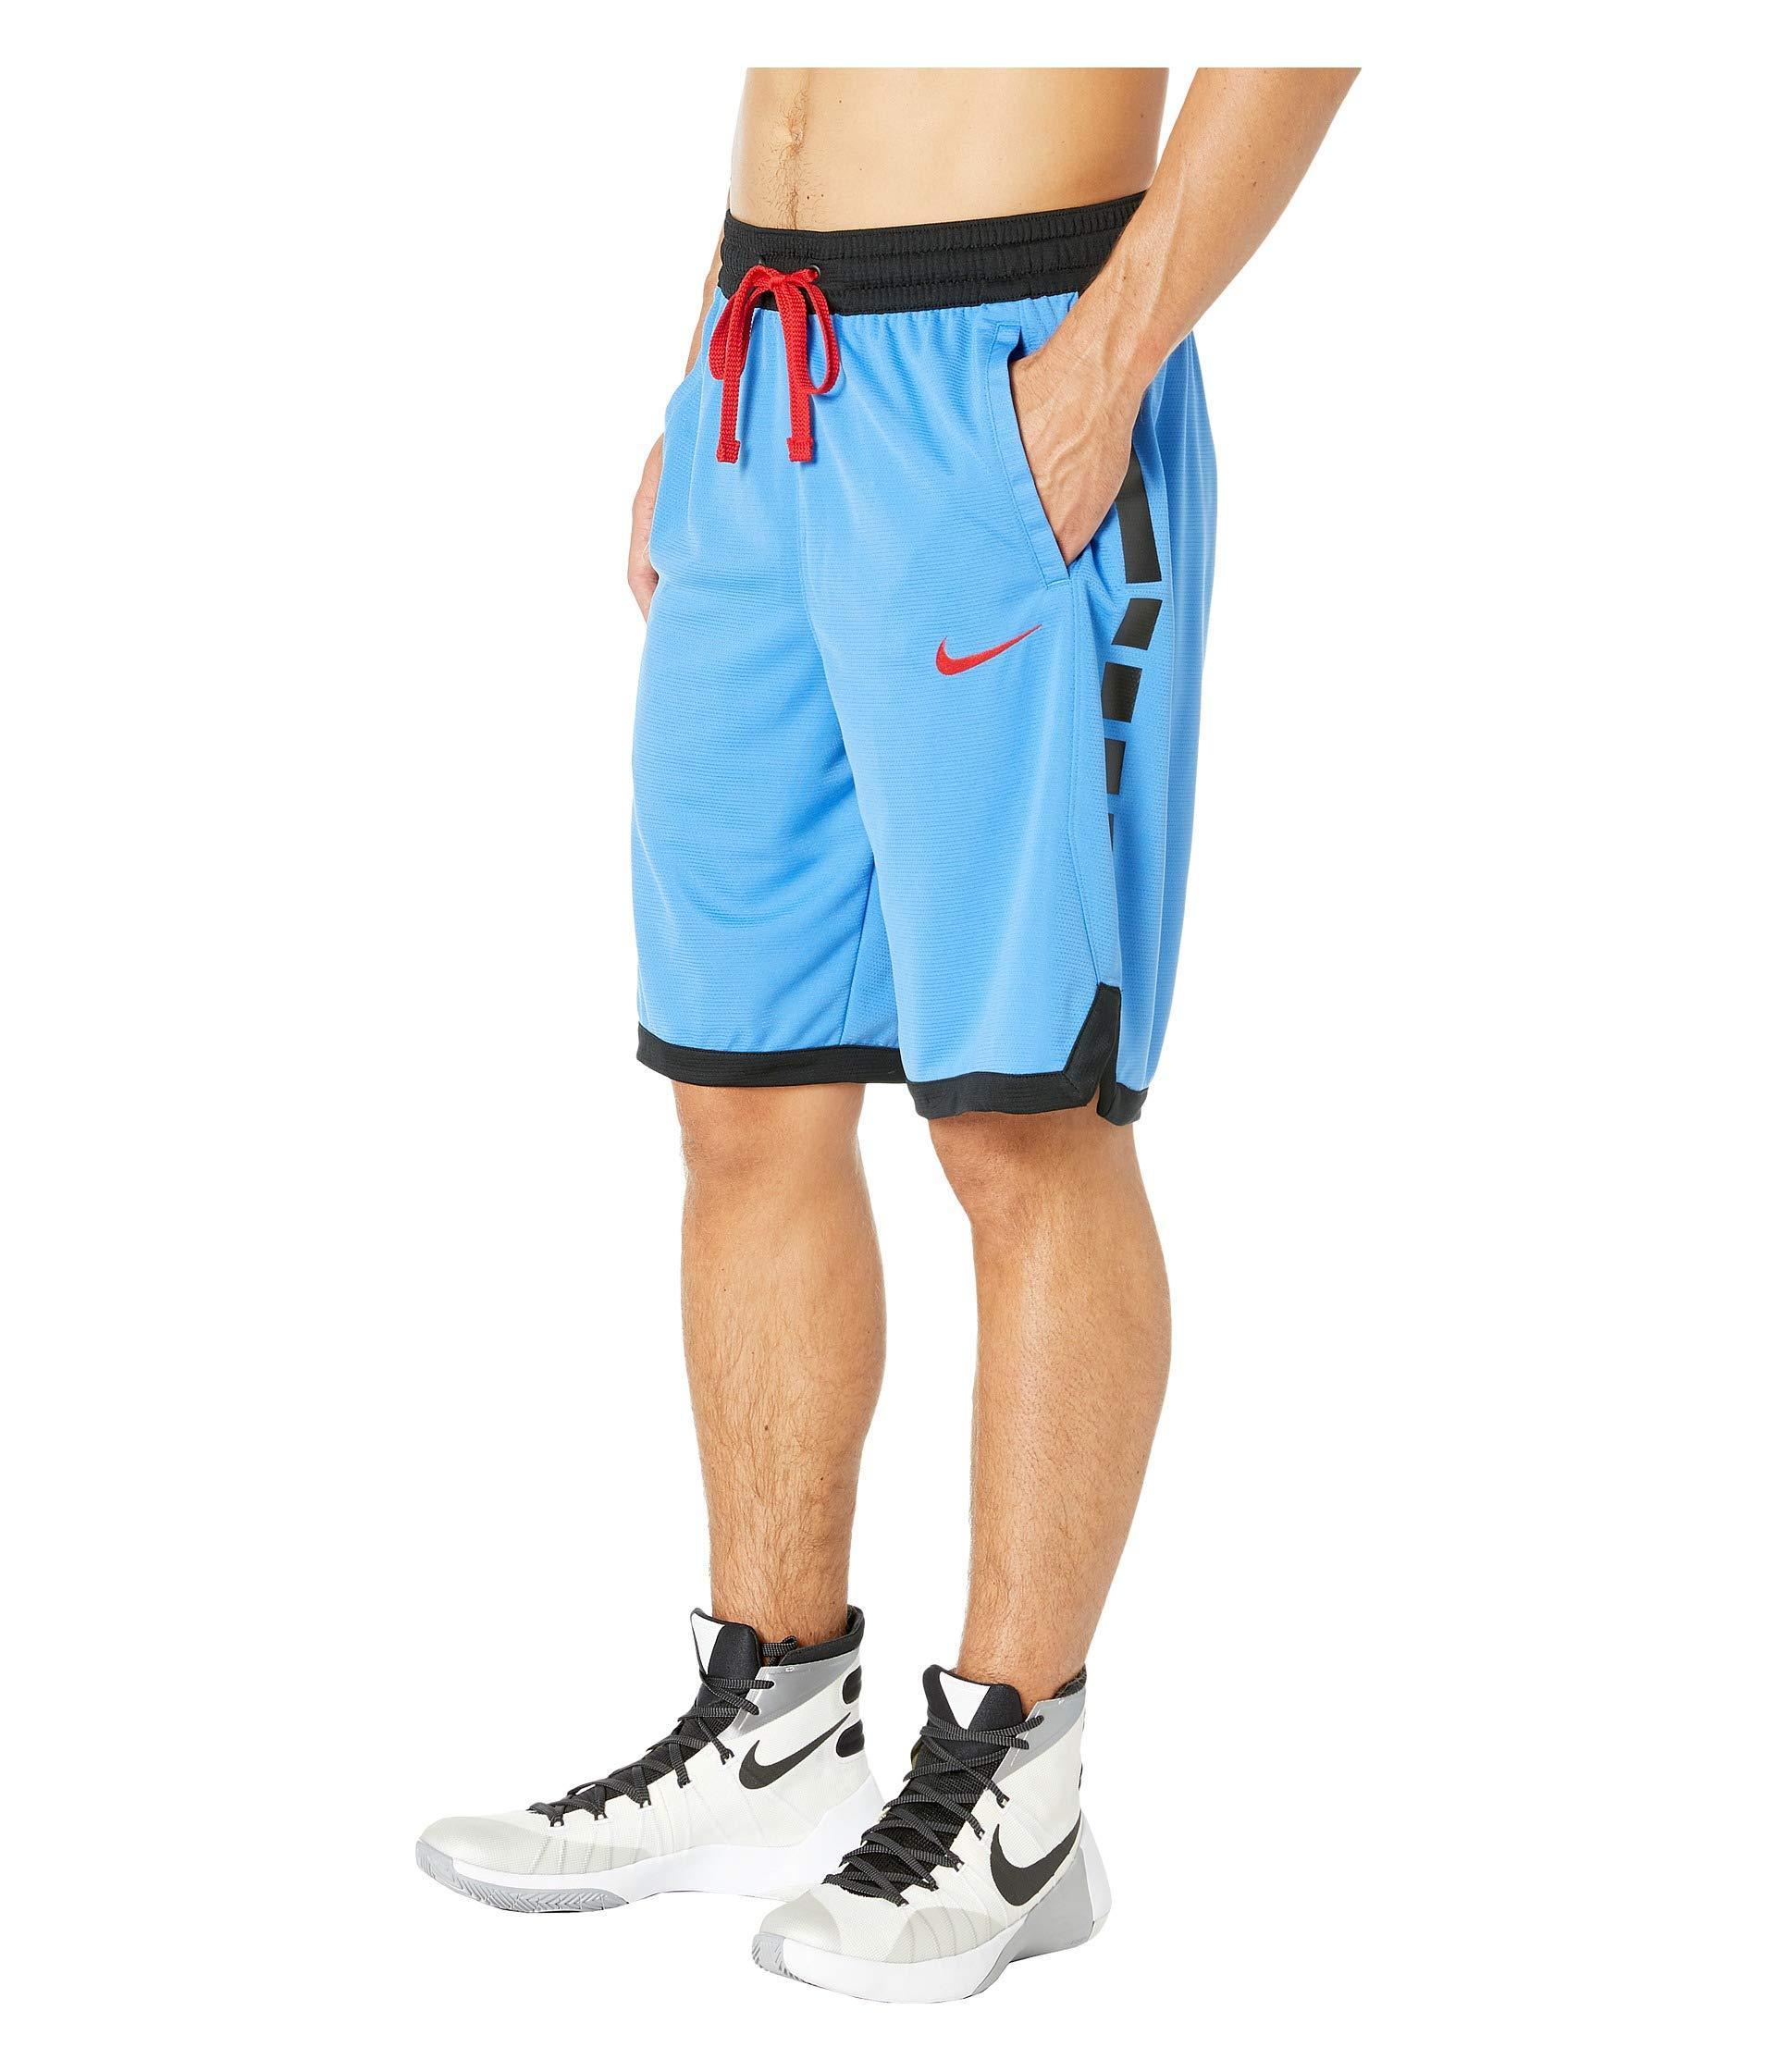 bc3393ae5ceb Lyst - Nike Dry Elite Shorts Stripe (white black black black) Men s Shorts  in Blue for Men